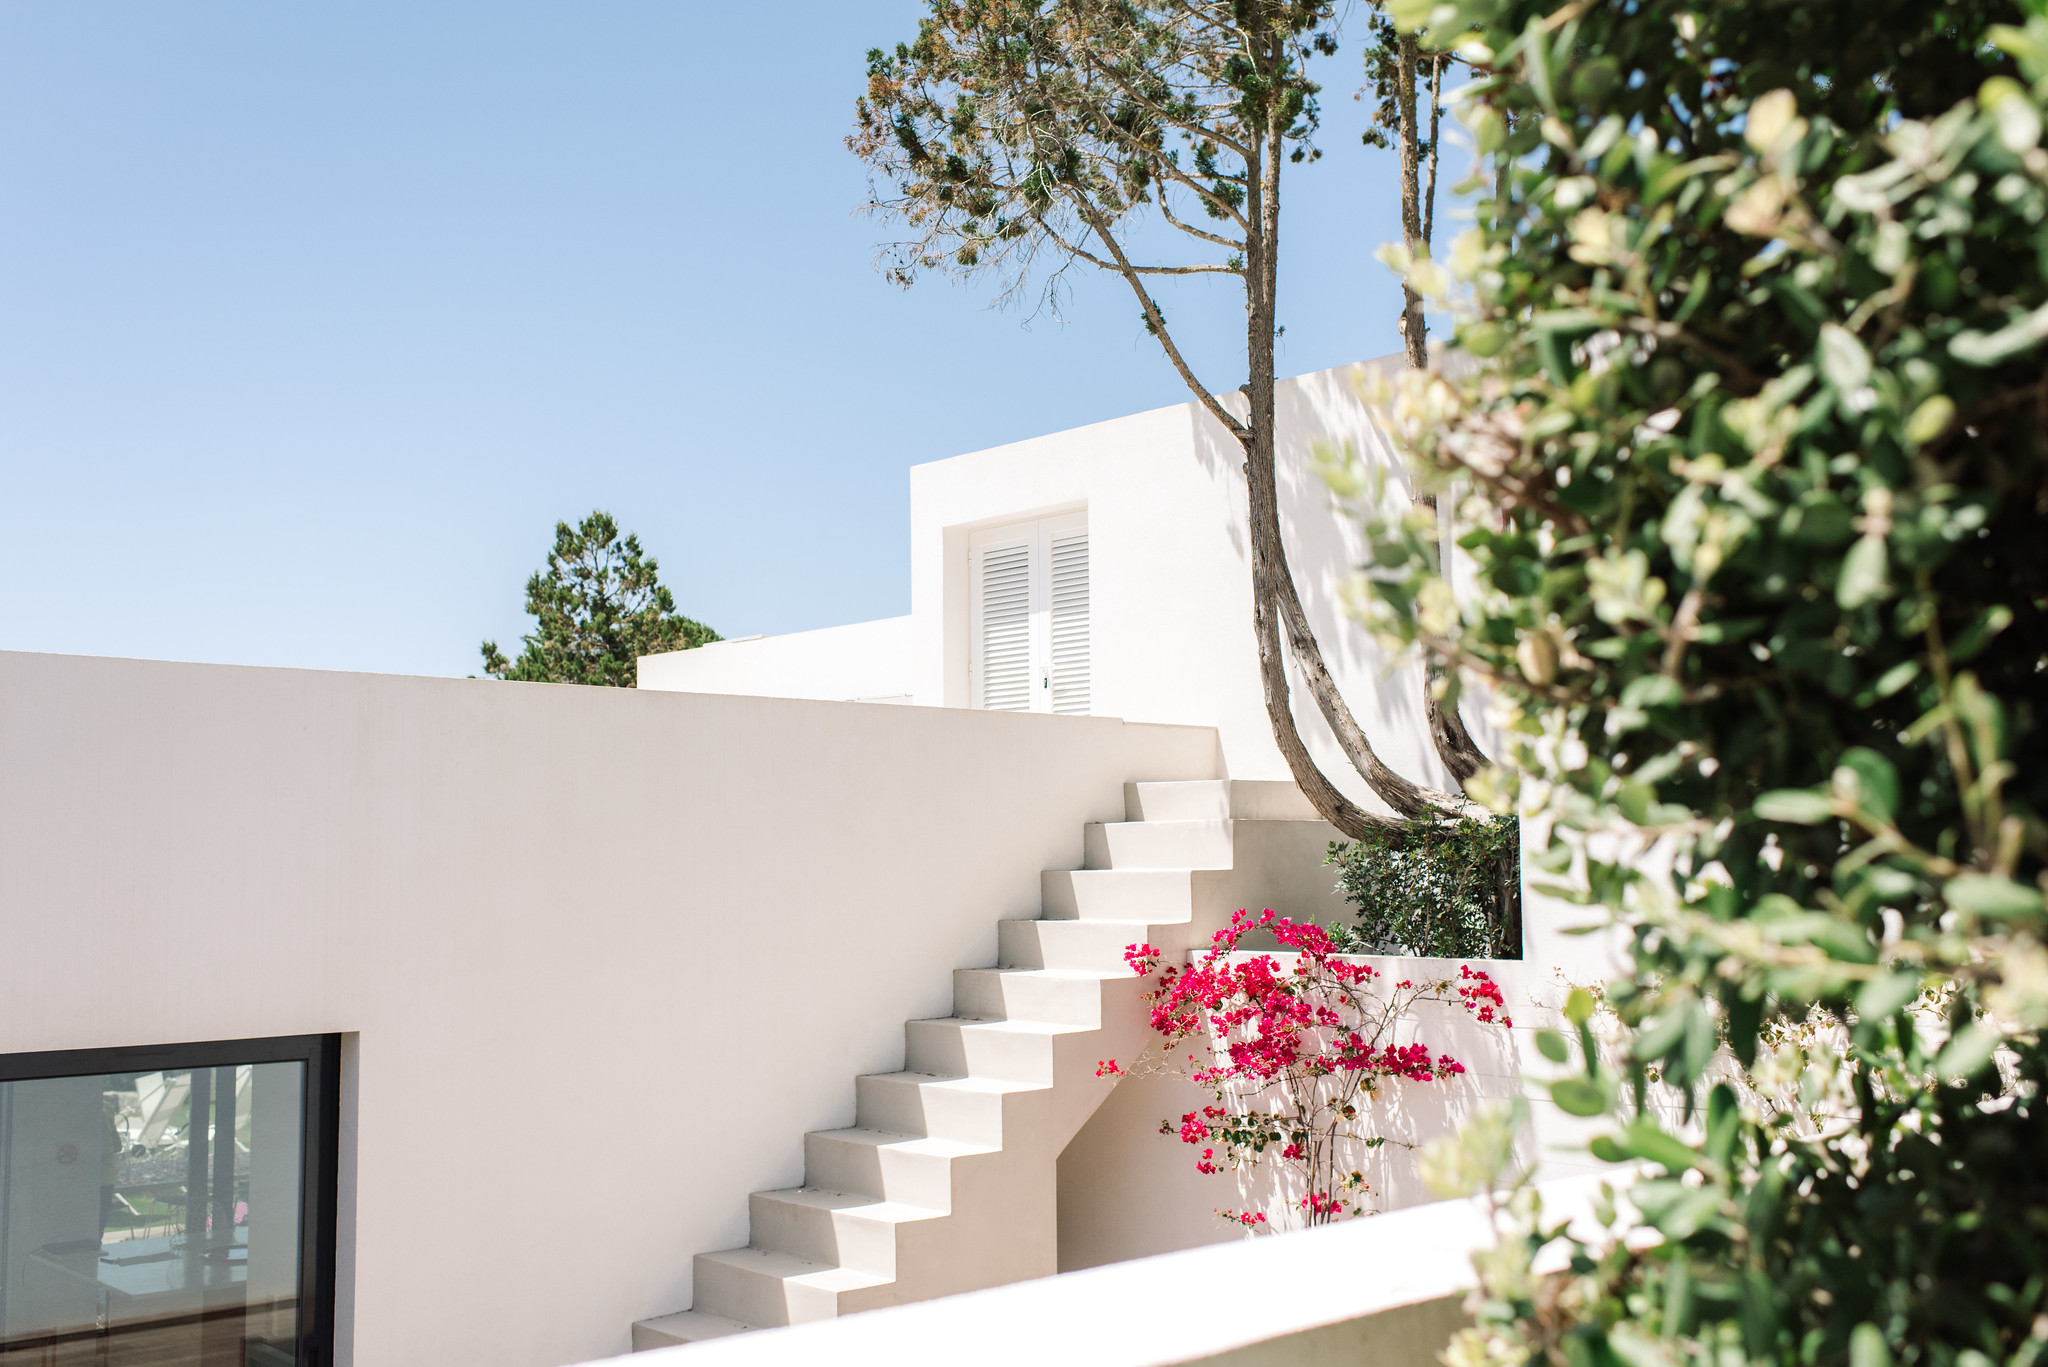 https://www.white-ibiza.com/wp-content/uploads/2020/06/white-ibiza-villas-can-jondal-exterior-stairs-1.jpg